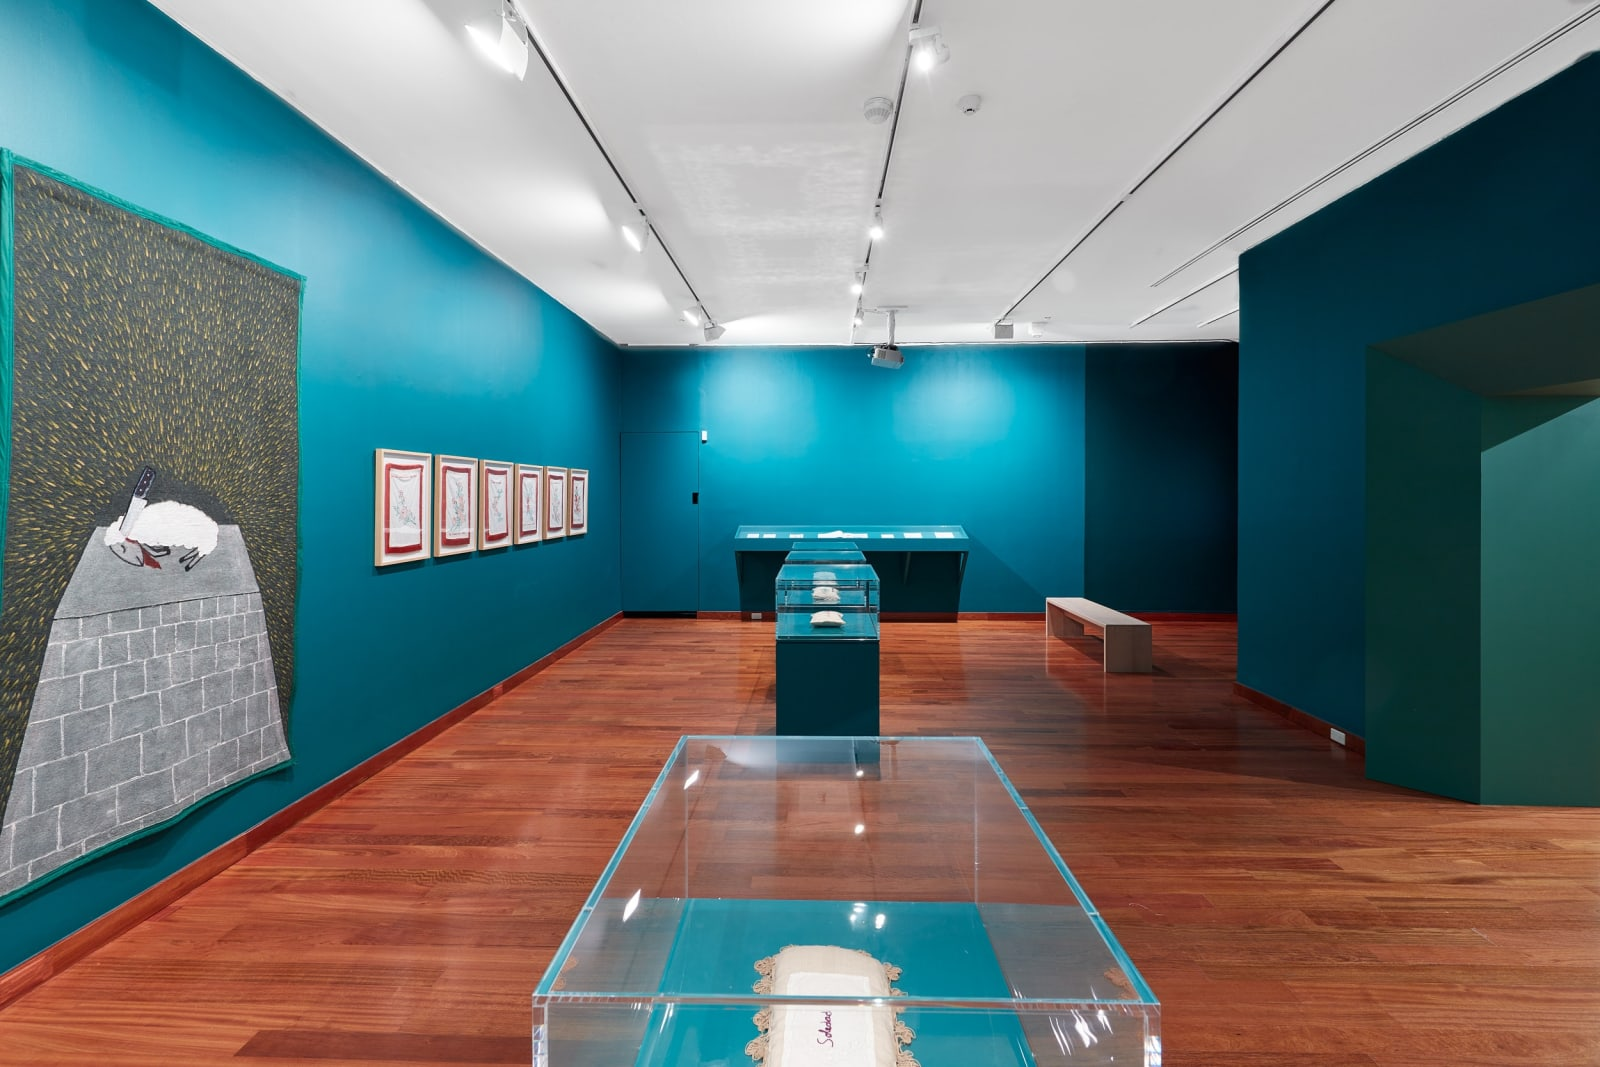 Installation view of Feliciano Centurión: Abrigo at Americas Society, February 14-May 16, 2020. Photo by OnWhiteWall.com, courtesy of Americas Society.